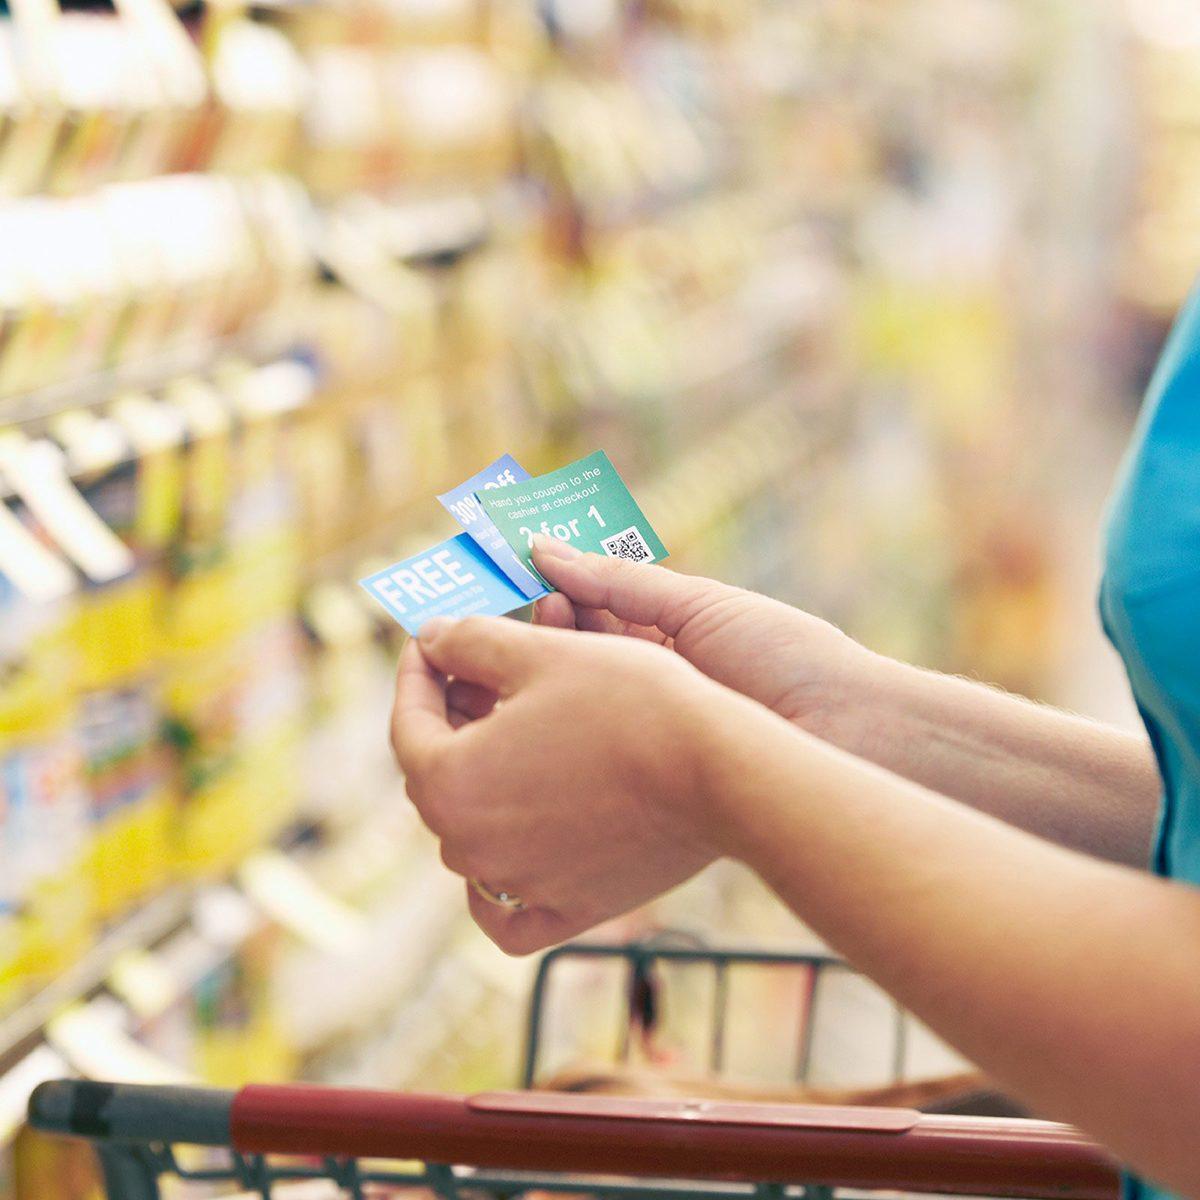 Checking coupons